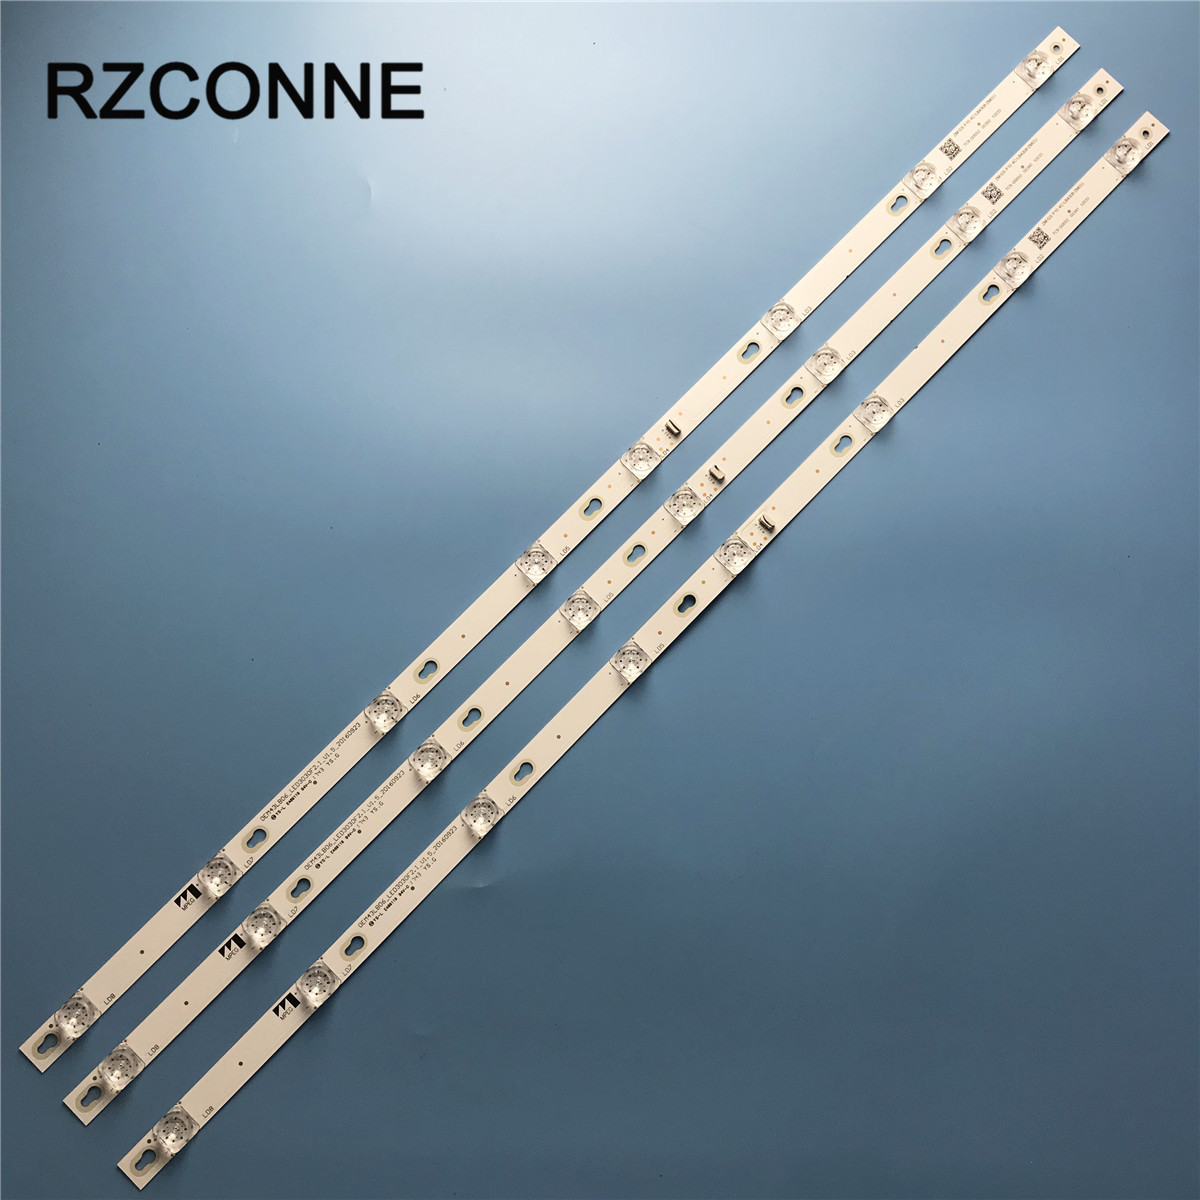 LED Backlight Strip 8 Lamp For TCL TOT_43D2900_3X8_3030C YHF-4C-LB4308-YH09J YHA-4C-LB4308-YH05J 43S305TABA 43S303 43DP608